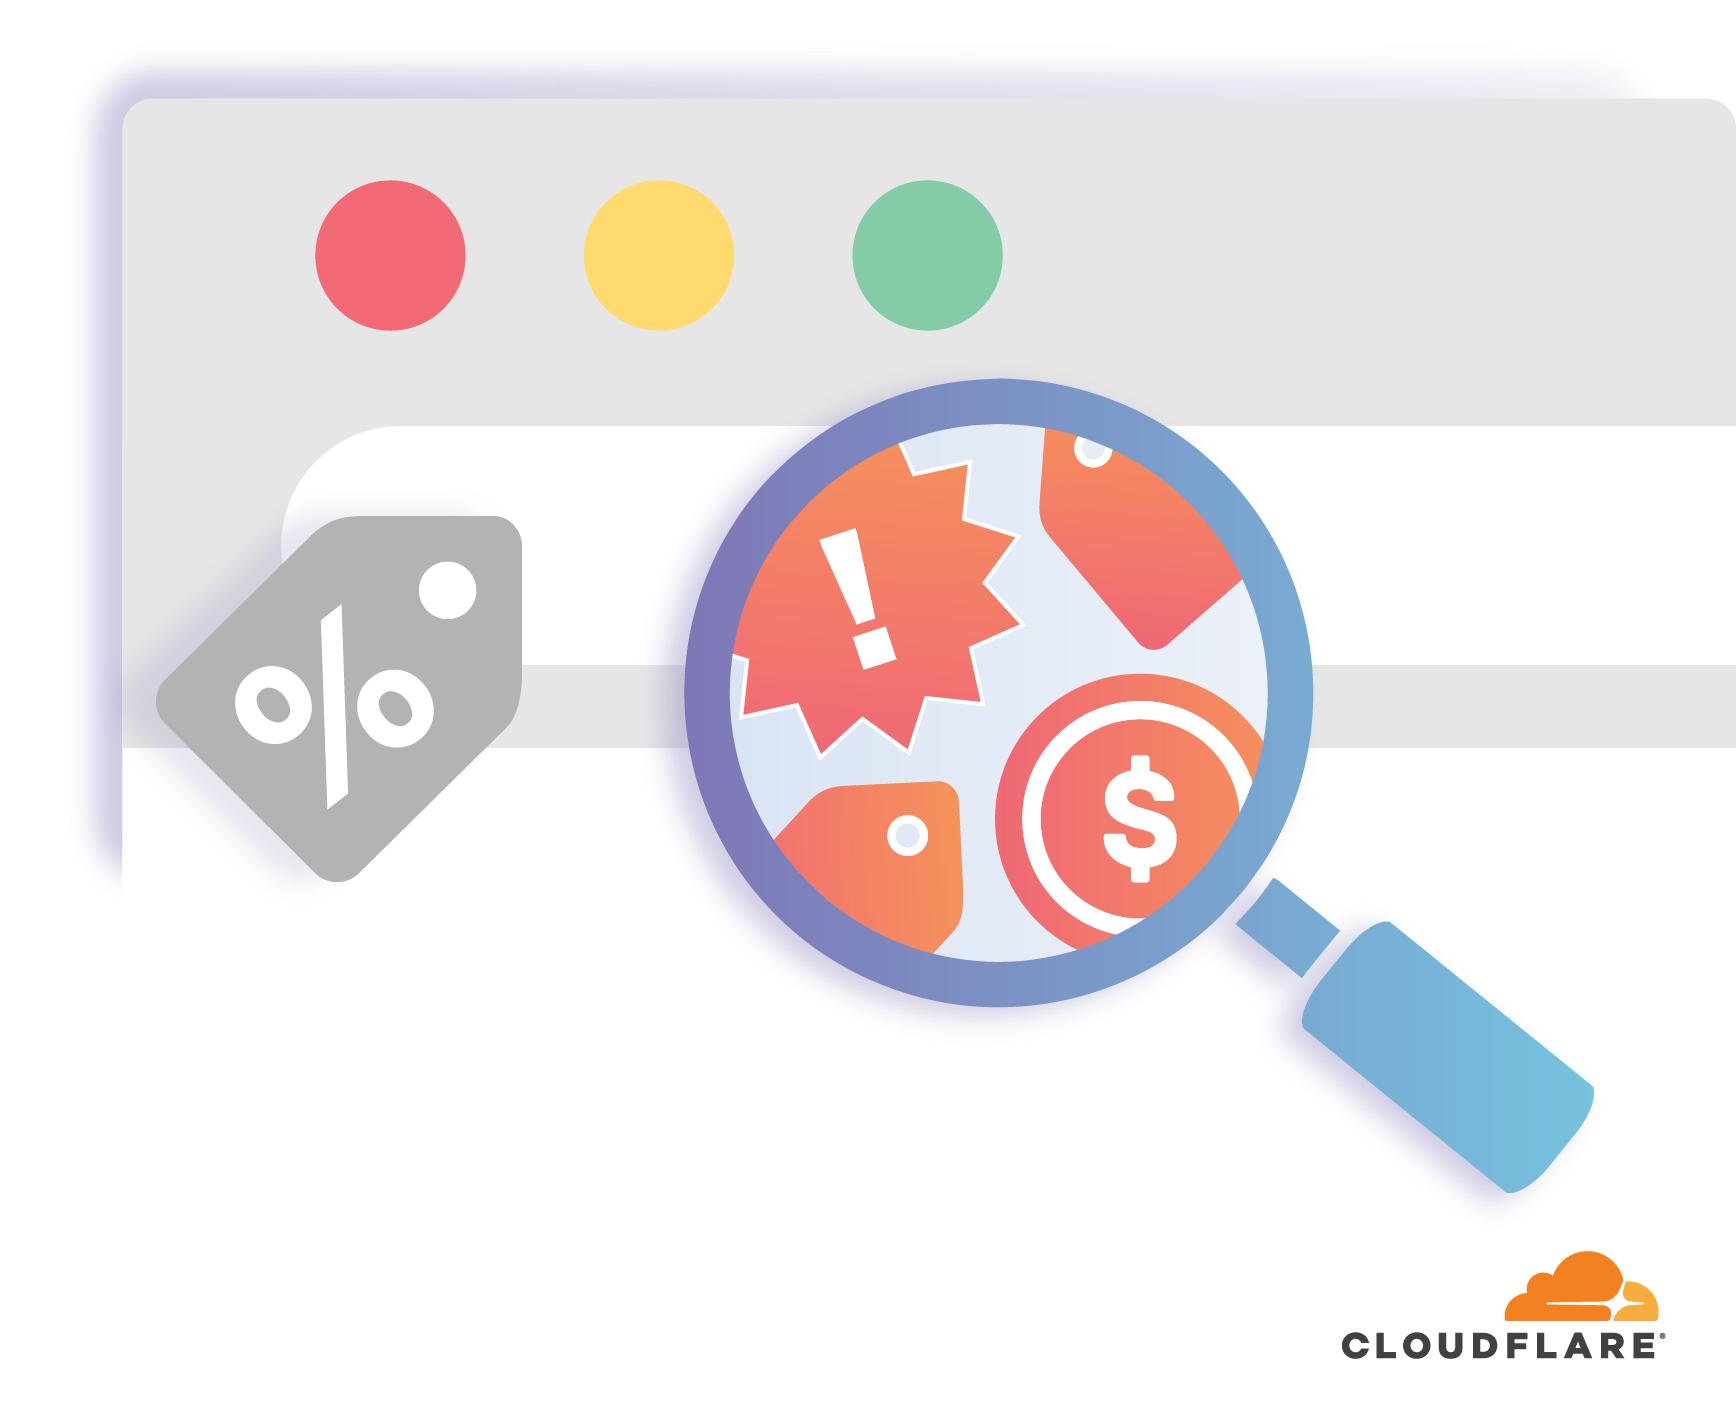 Introducing Cloudflare Registrar: Domain Registration You